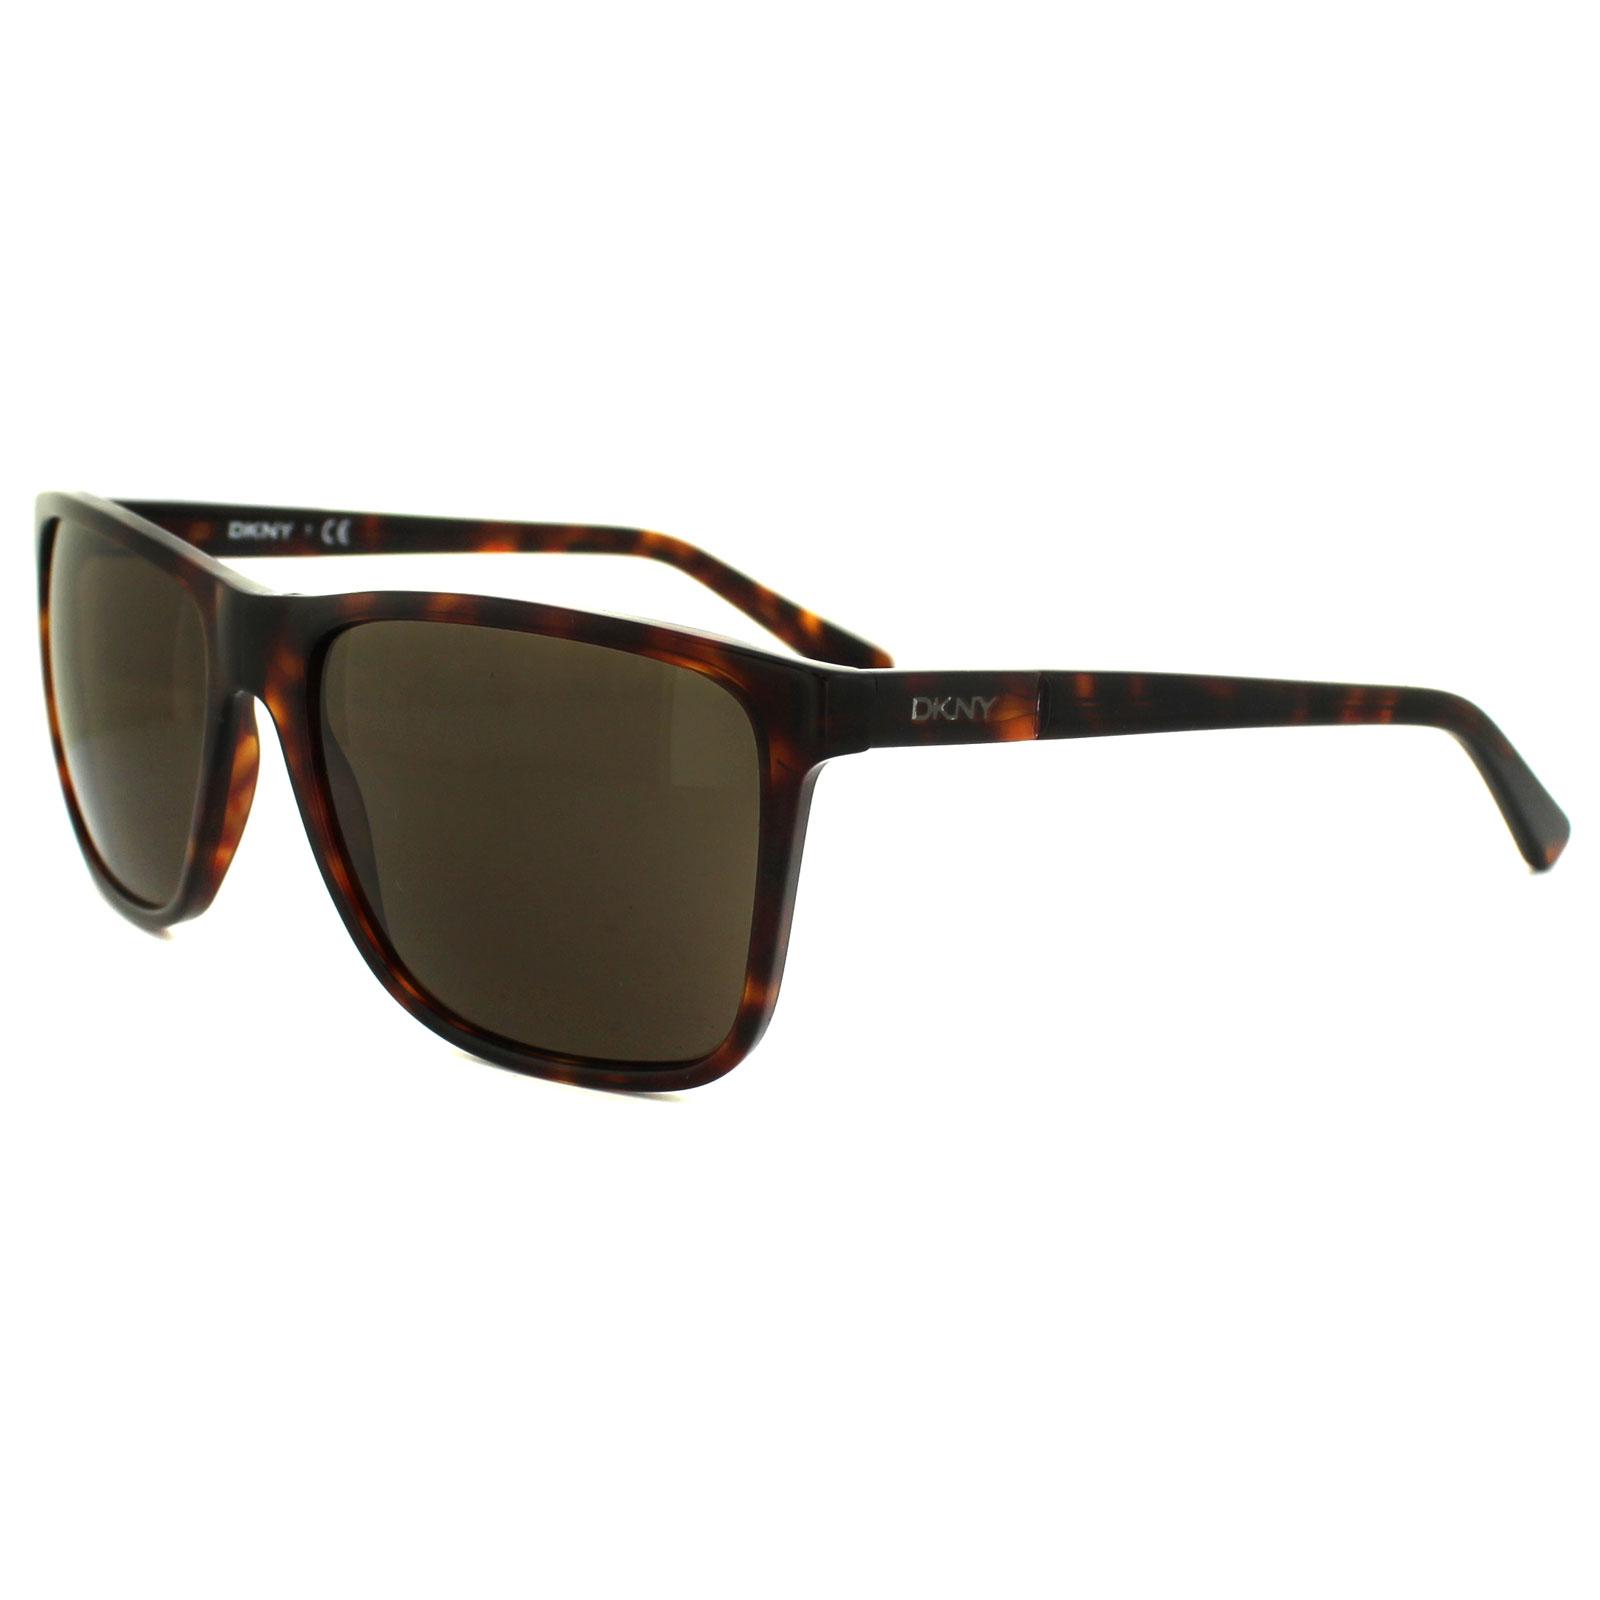 0465d33e00b2 Cheap DKNY 4127 Sunglasses - Discounted Sunglasses